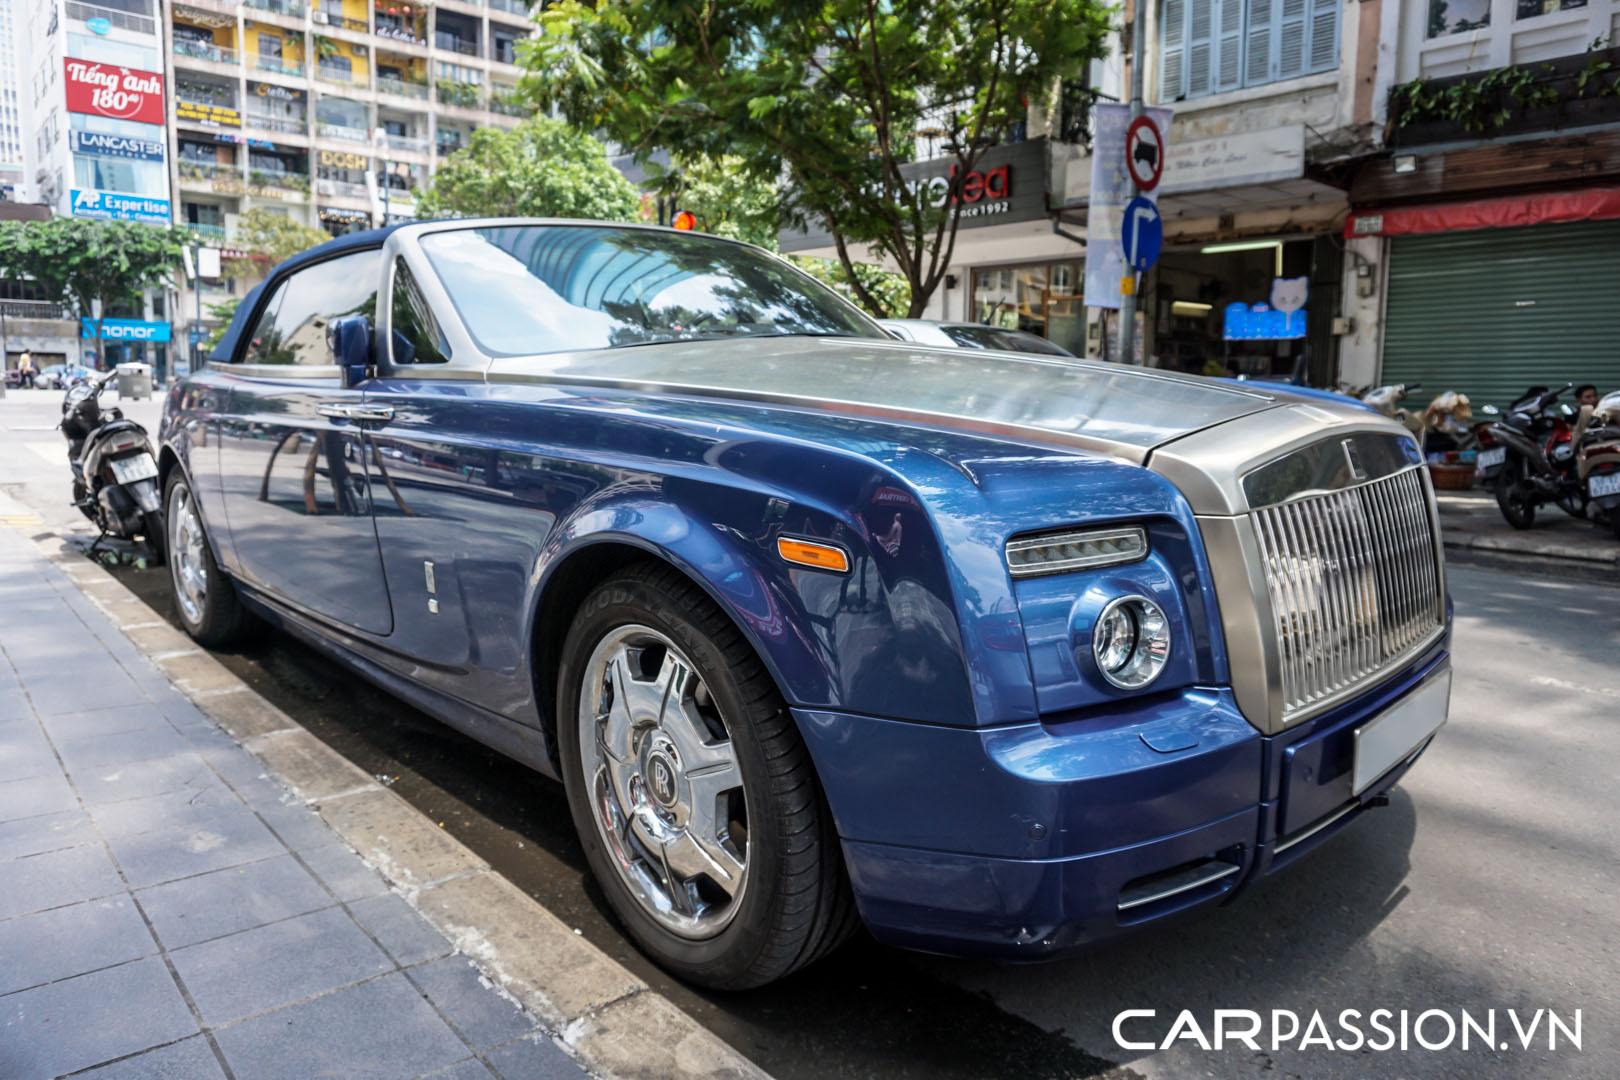 CP-Rolls-Royce Phantom Drophead Coupe xanh (3).jpg